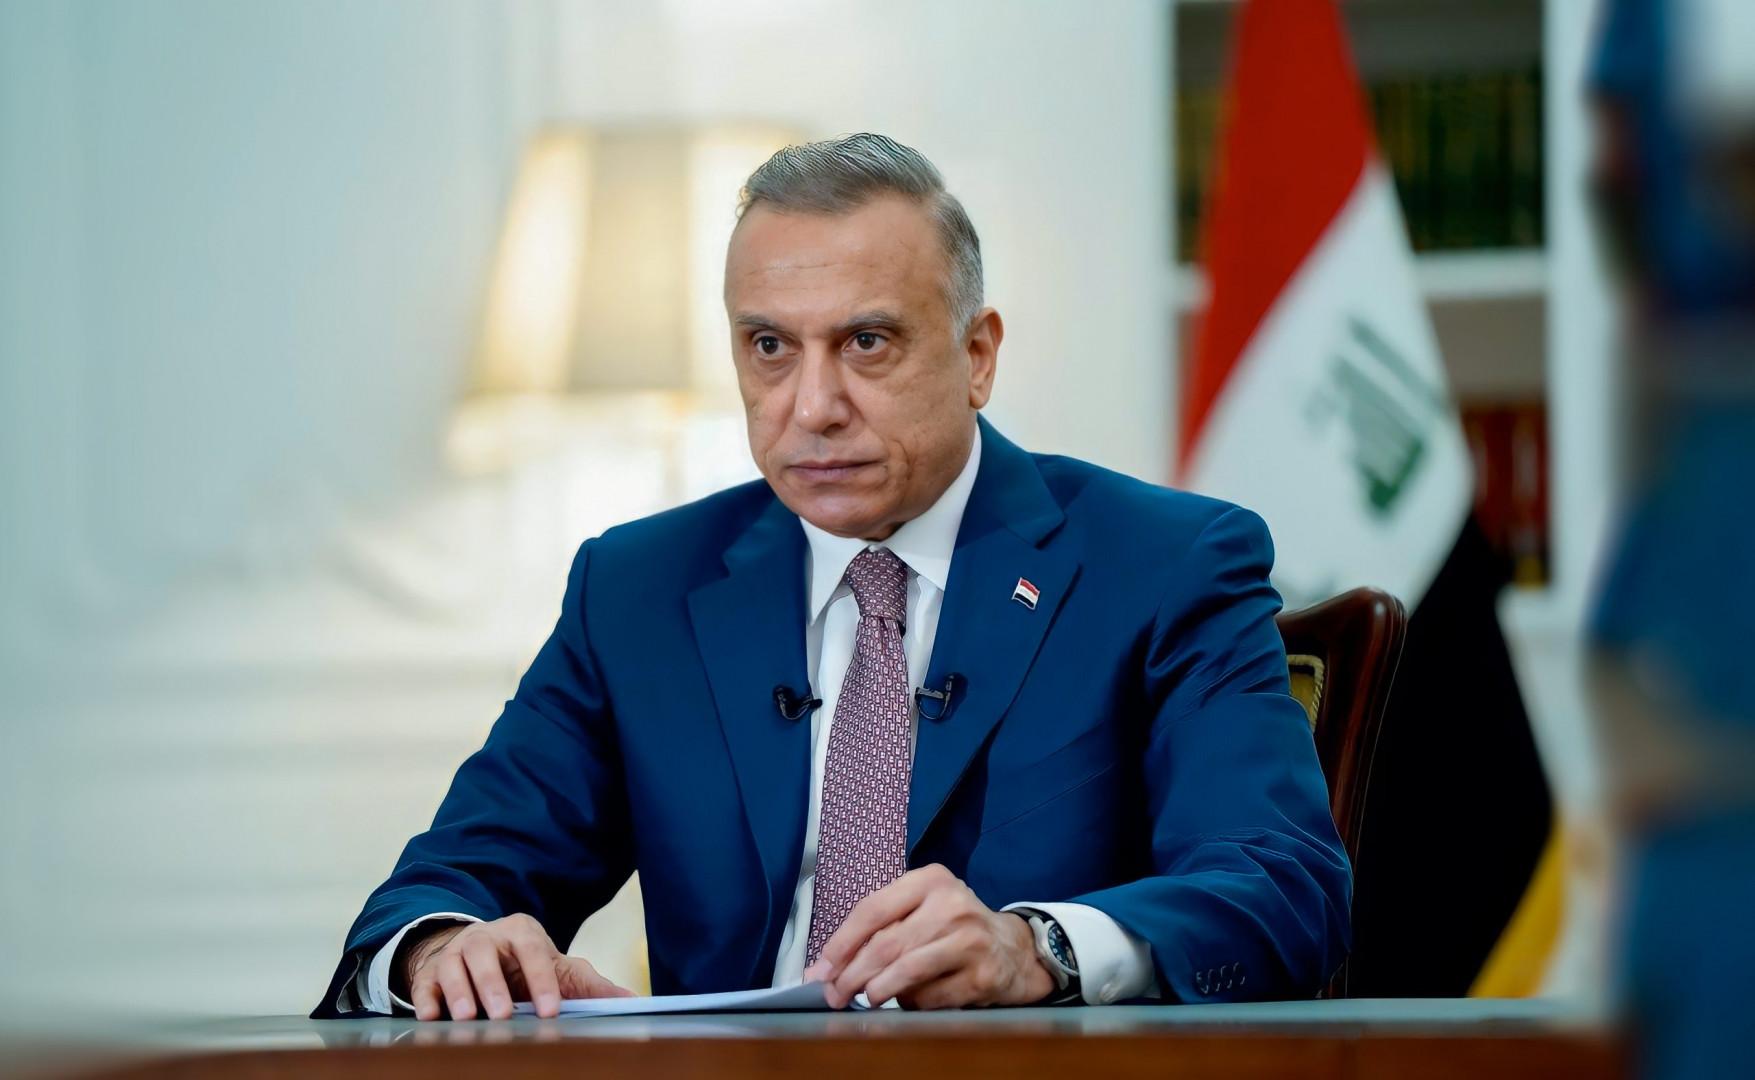 Iraqi Prime Minister Visits Washington In Hopes Of U.S. Troop Withdrawal